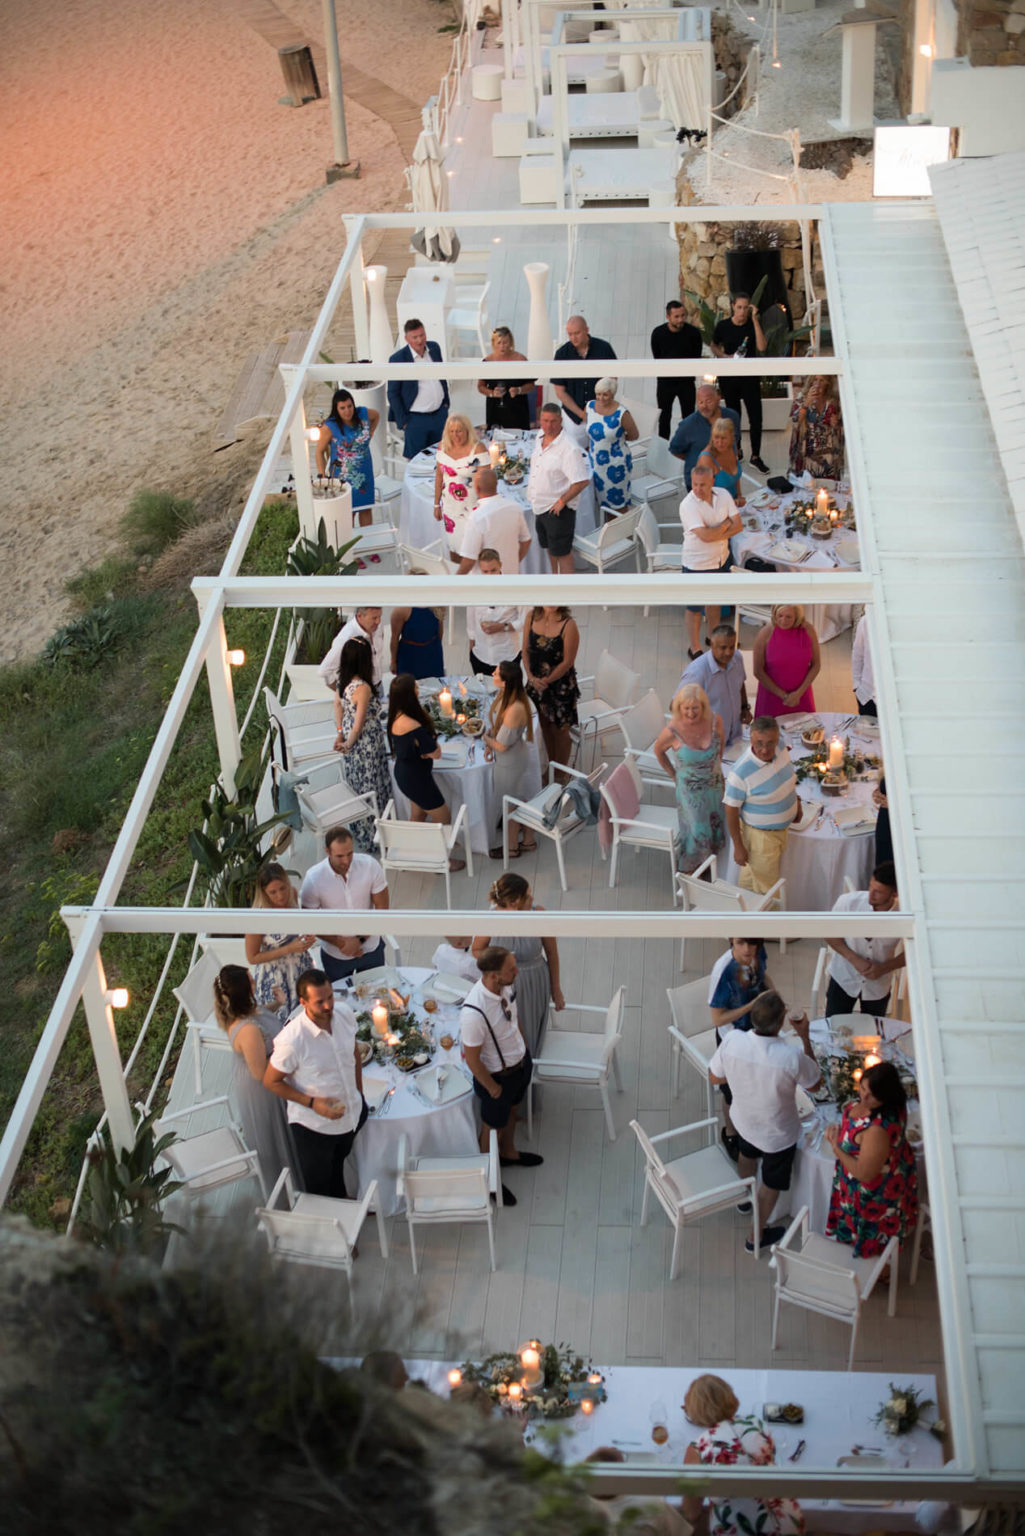 https://www.white-ibiza.com/wp-content/uploads/2020/03/ibiza-wedding-venue-maya-beach-club-2020-05-1025x1536.jpg